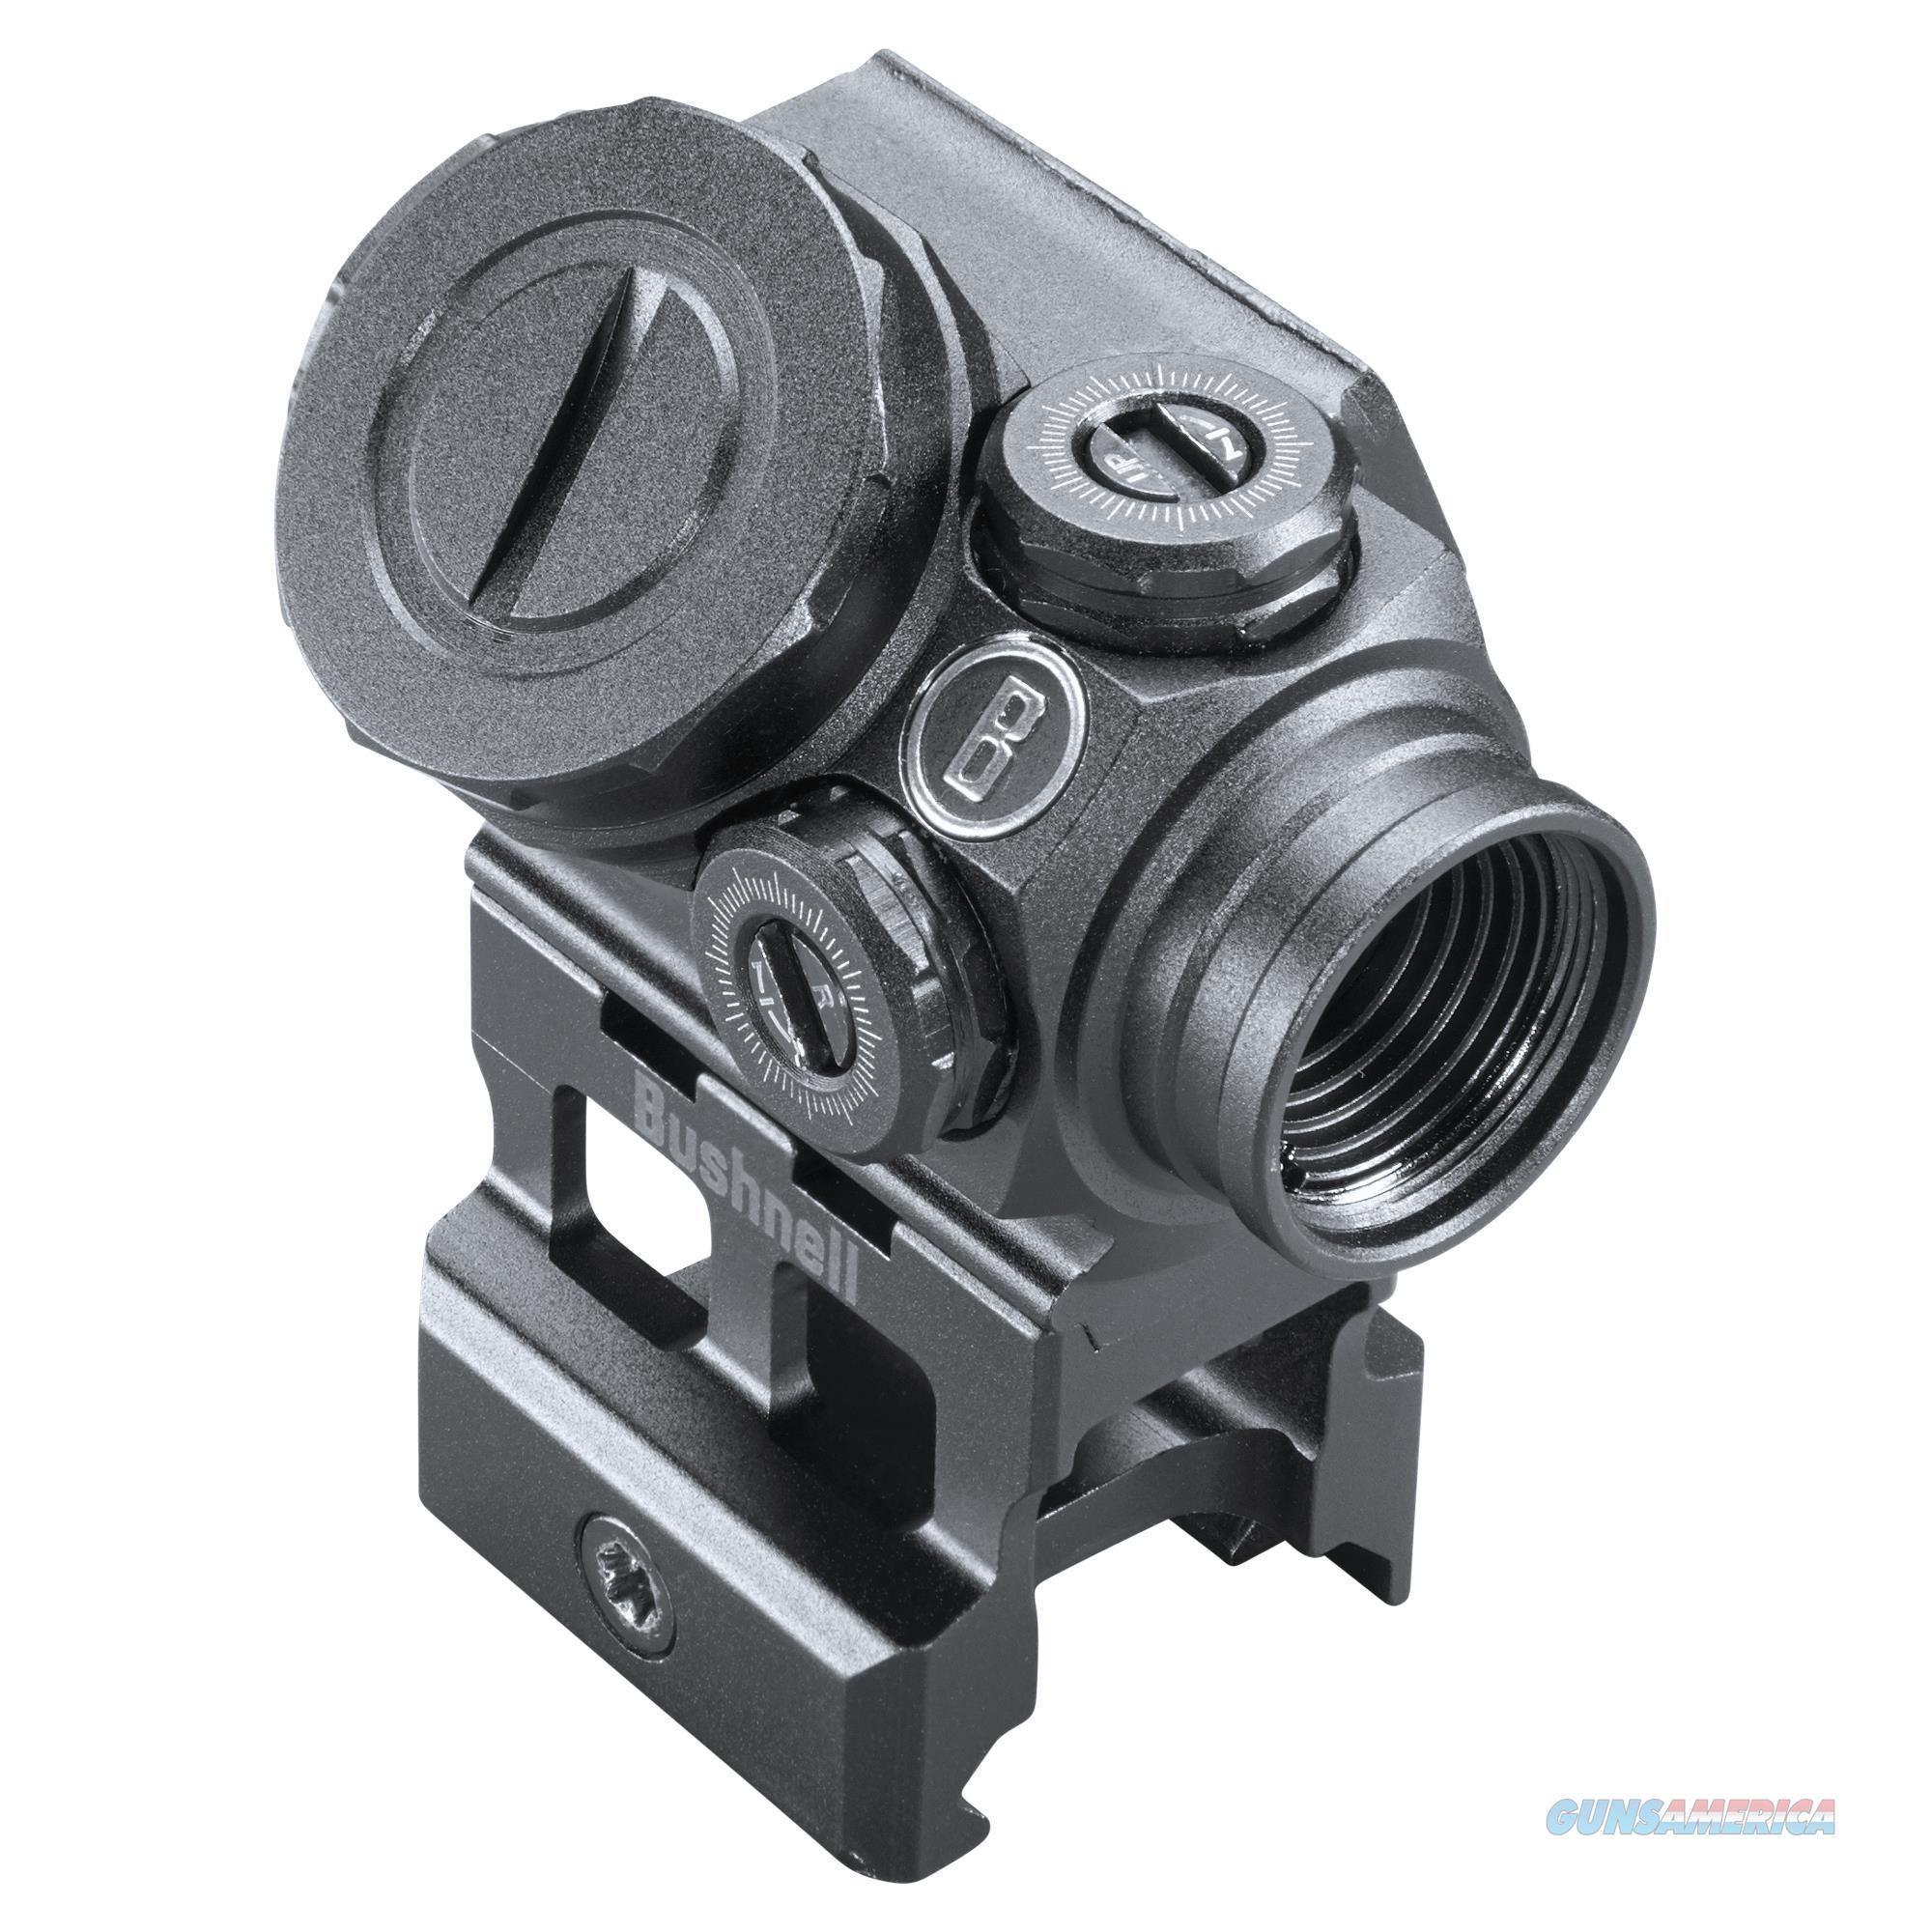 Bushnell Tac Optic Riflescope, 1X Prism Circle Dot, Picatinny Base, Box 5L BT71XPS  Non-Guns > Iron/Metal/Peep Sights